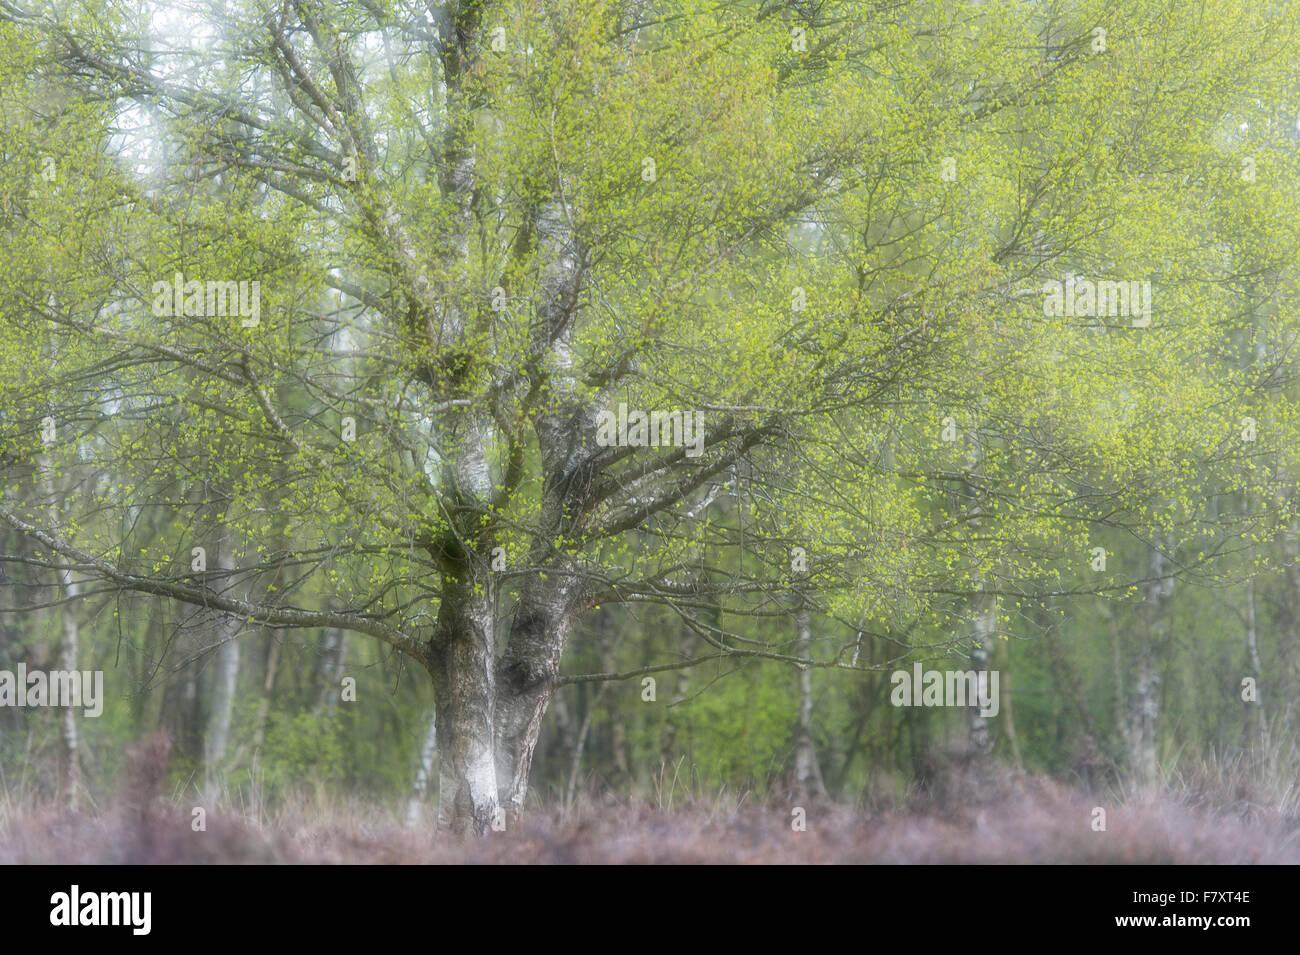 birch tree in moor, lower saxony, germany - Stock Image